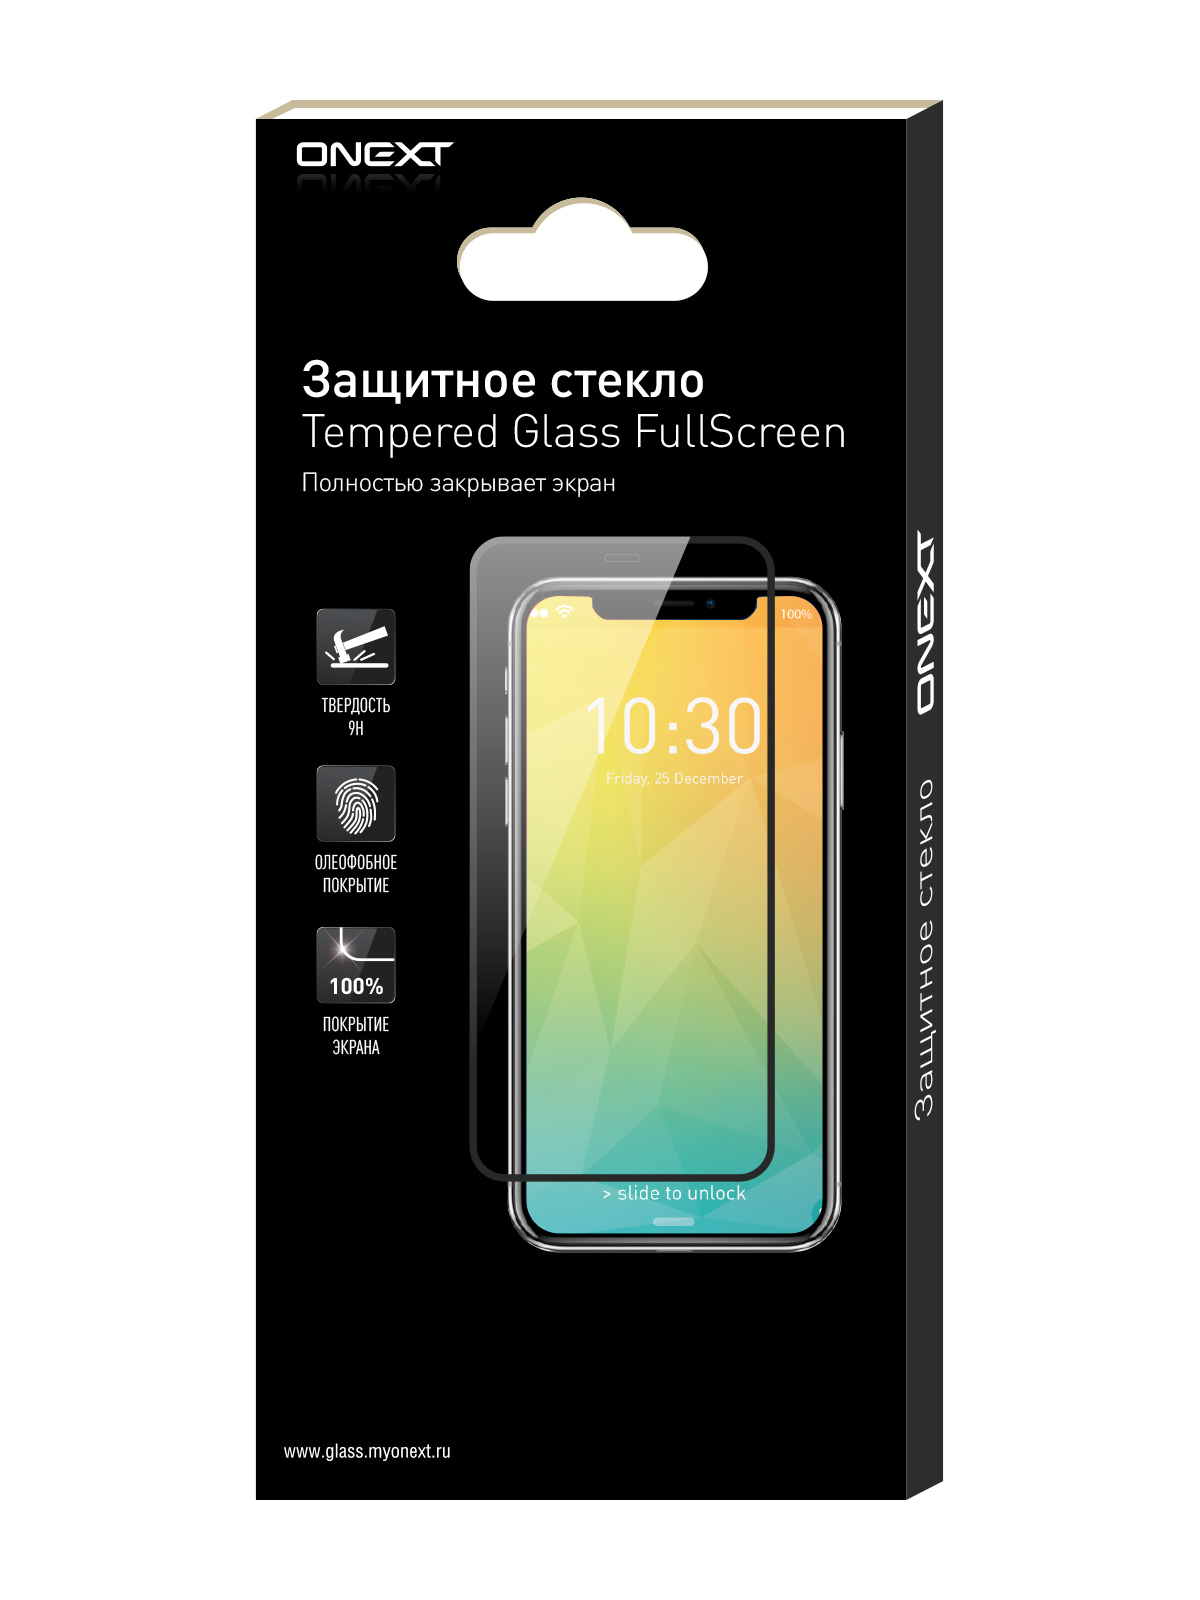 Защитное стекло ONEXT для Huawei P10 Lite White